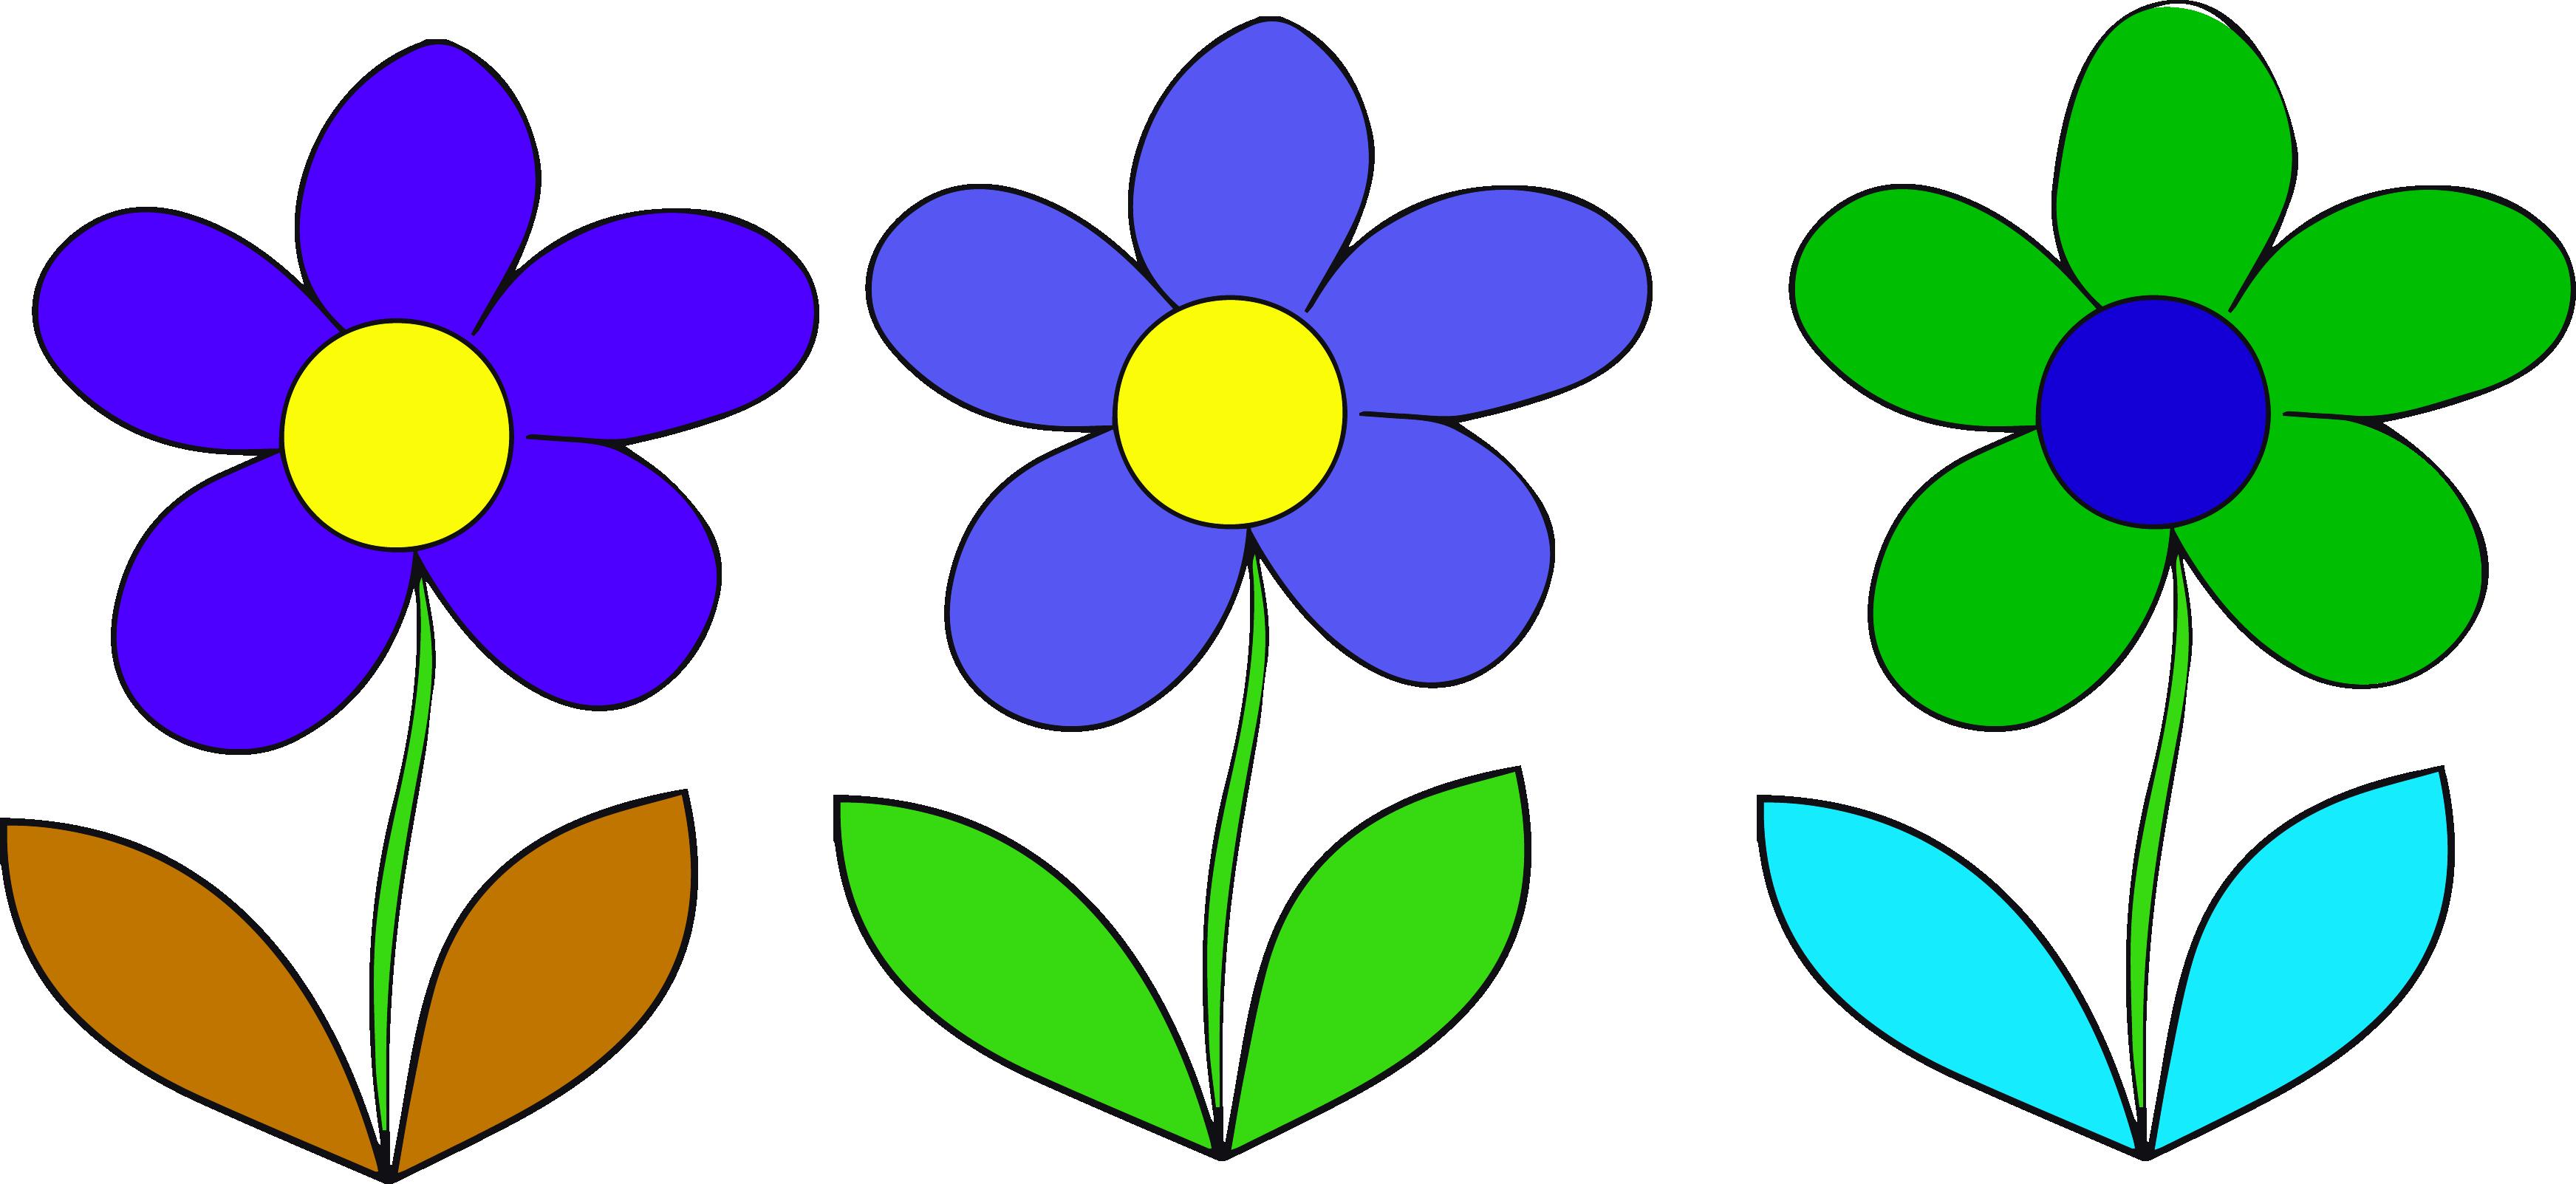 Daisies clipart summer. Daisy flowerclip frames illustrations